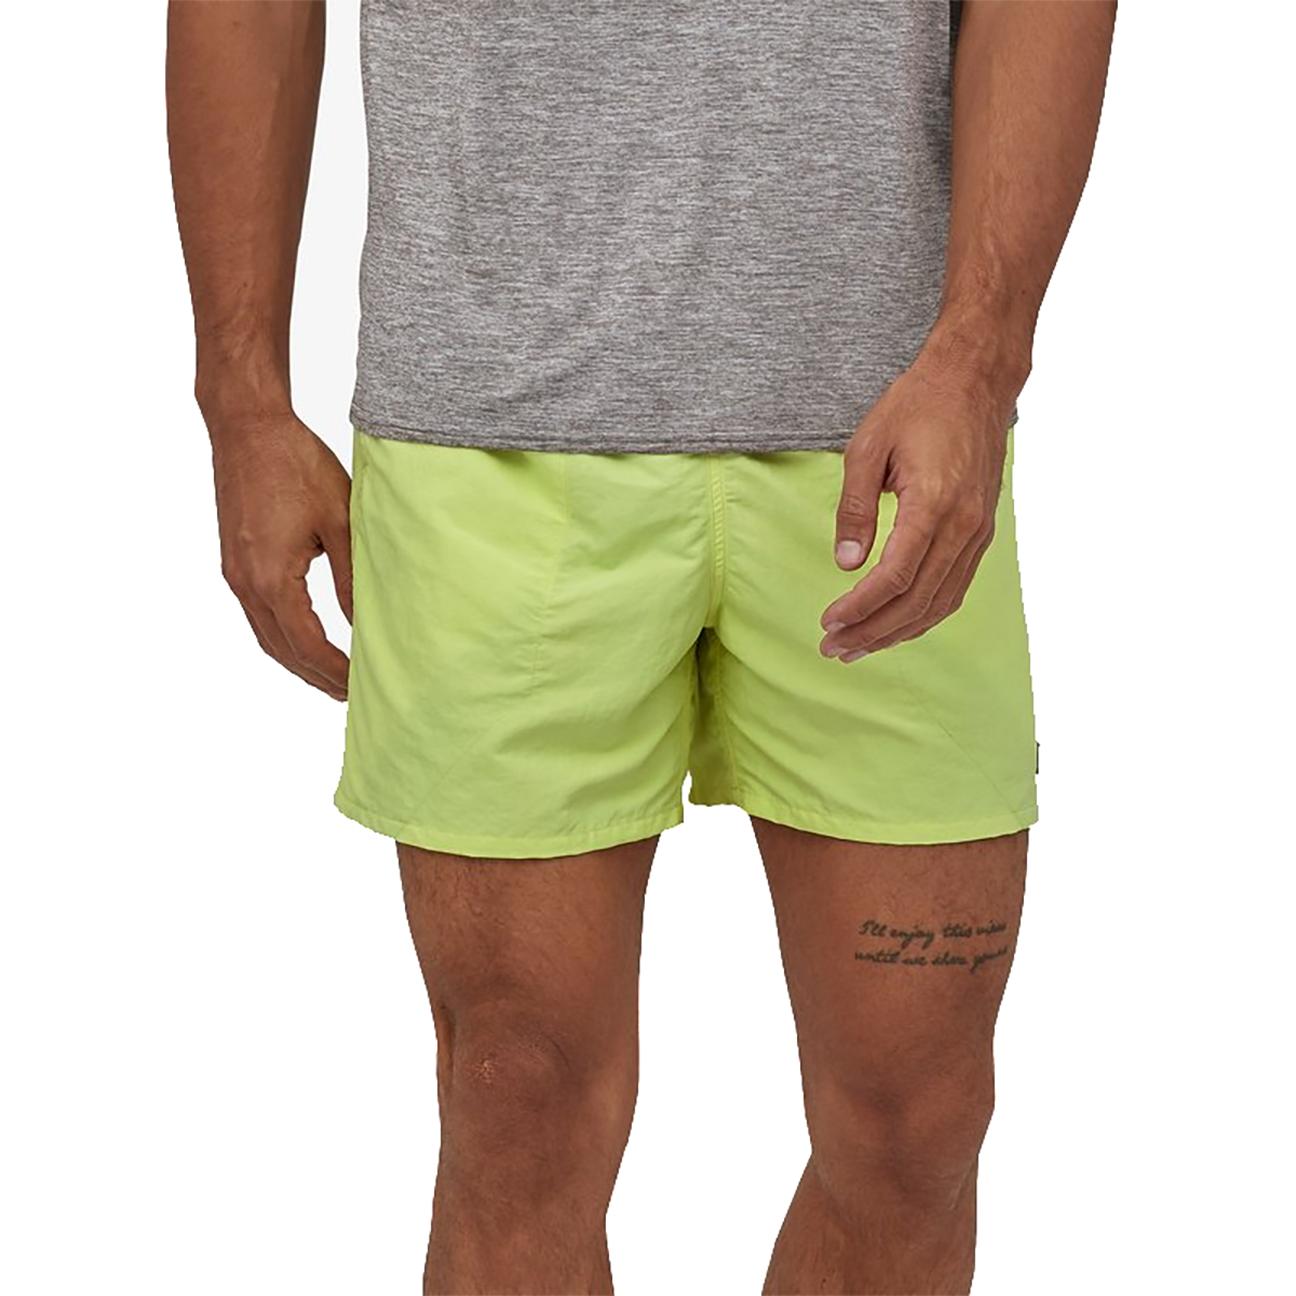 "Men's Baggies Shorts - 5"", Jellyfish Yellow-2"